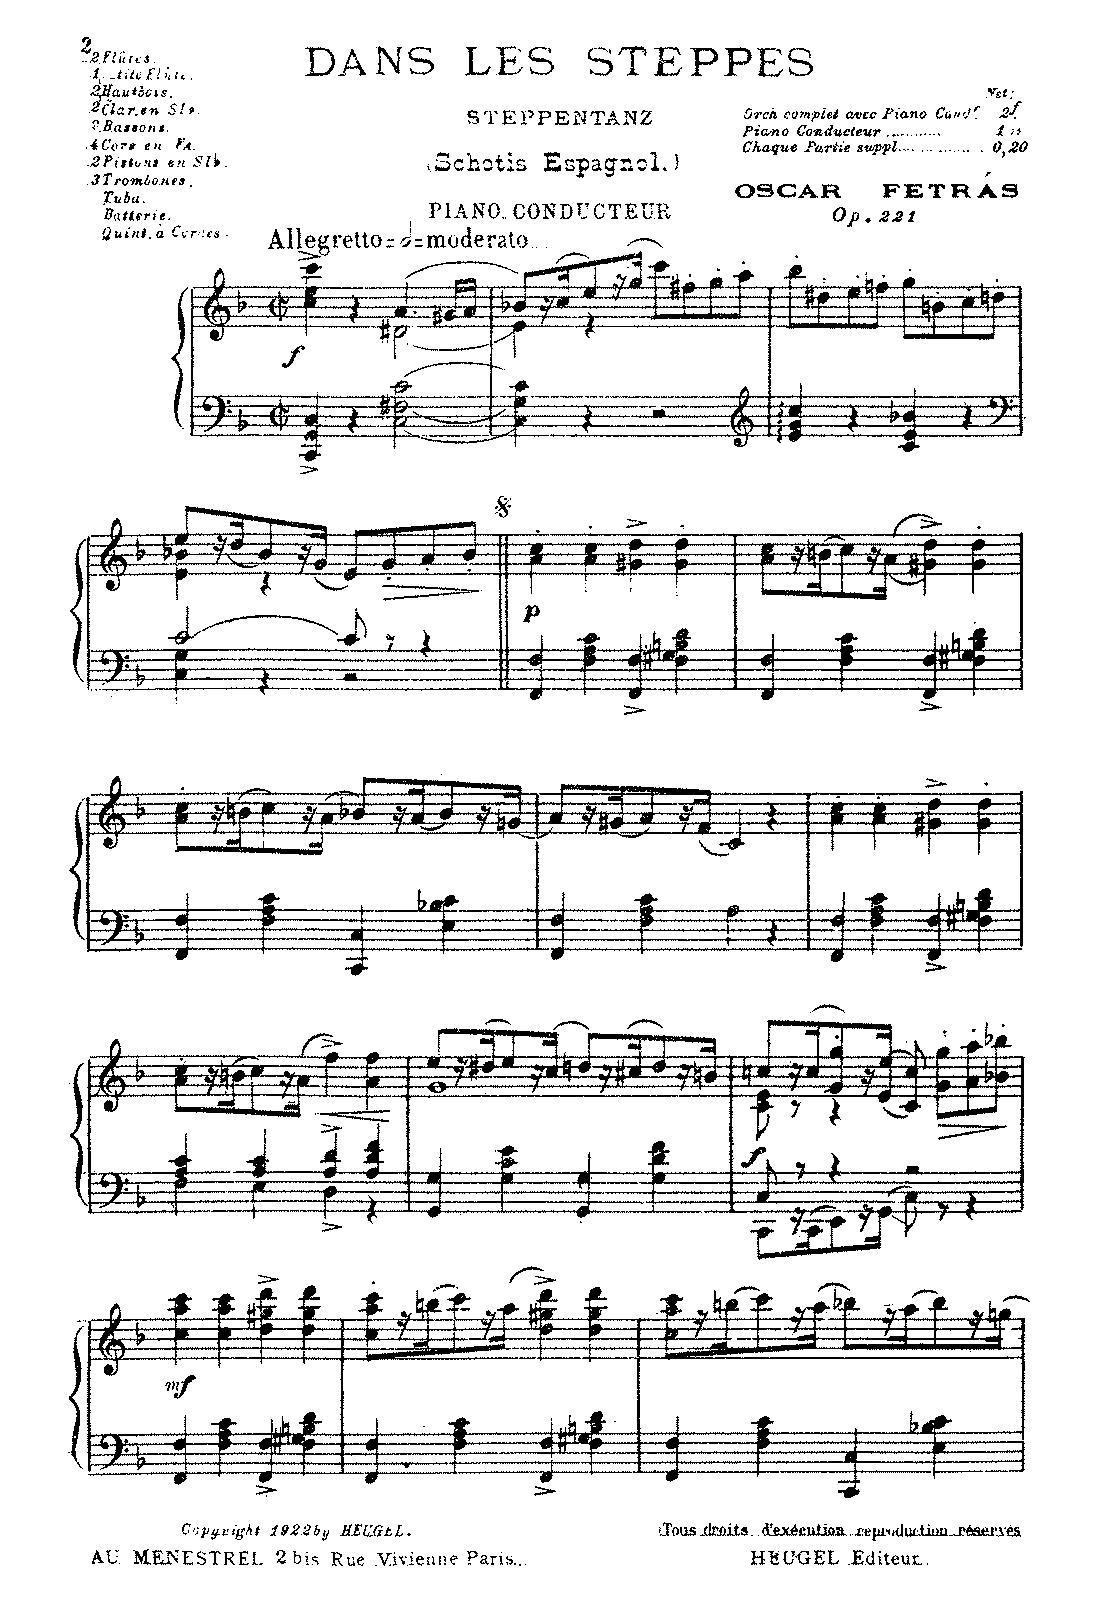 Dans les steppes, Op 221 (Fetrás, Oscar) - IMSLP/Petrucci Music